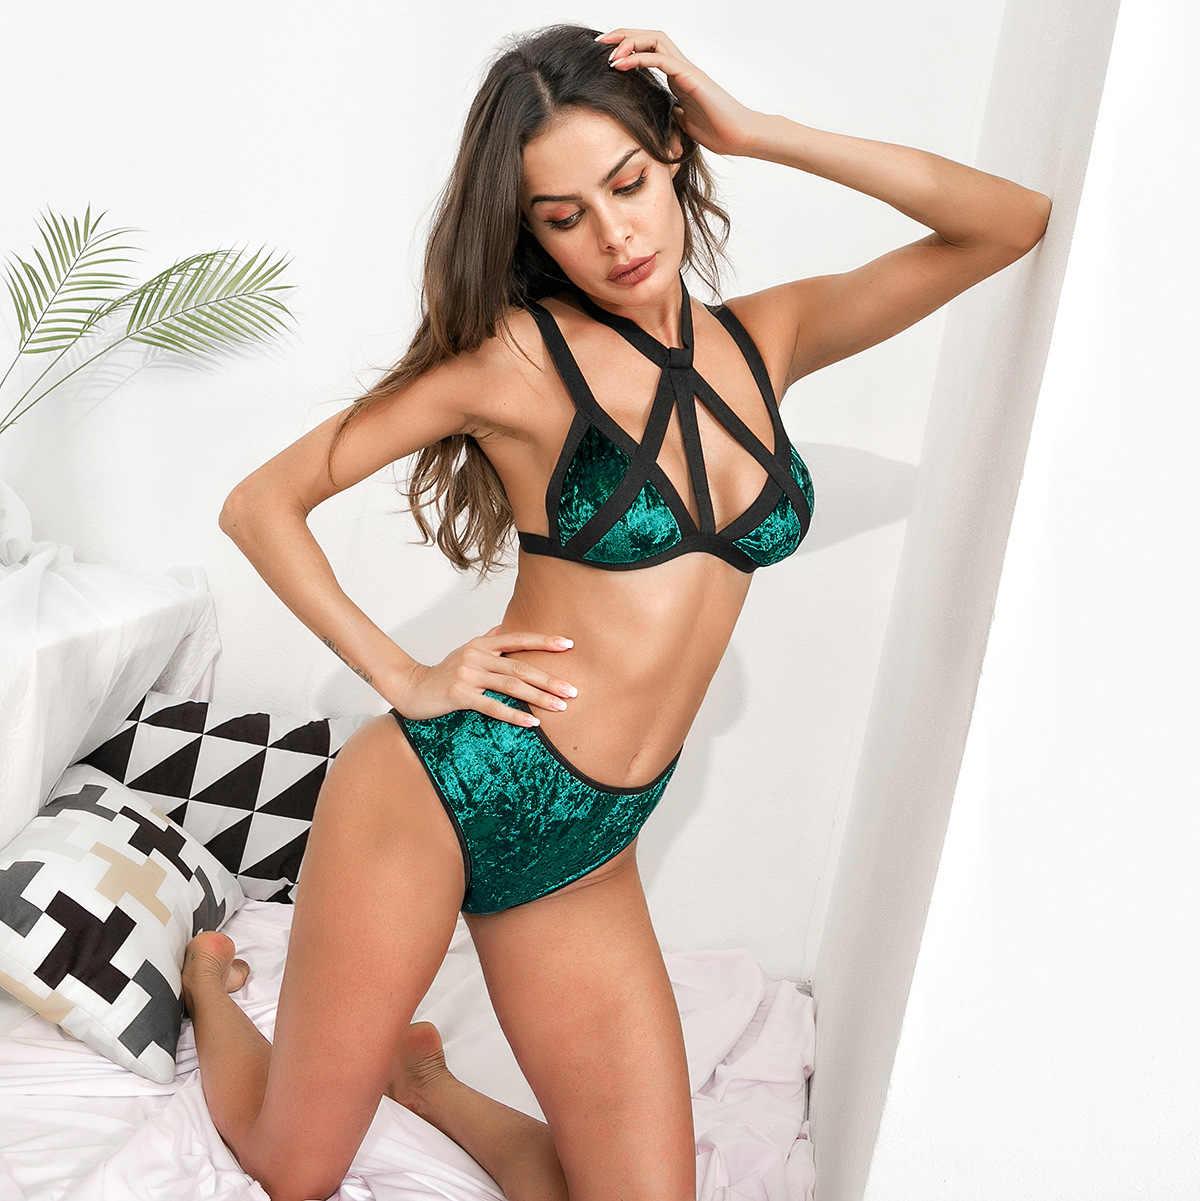 1e07852d046 Velvet Bralette Soft Triangle Bralet Outfit Crop Top Modest Elegant Bra  Cami Ladies lingerie. US  12.80. 4.6 (5). 10 Orders. underwear set women  velour ...